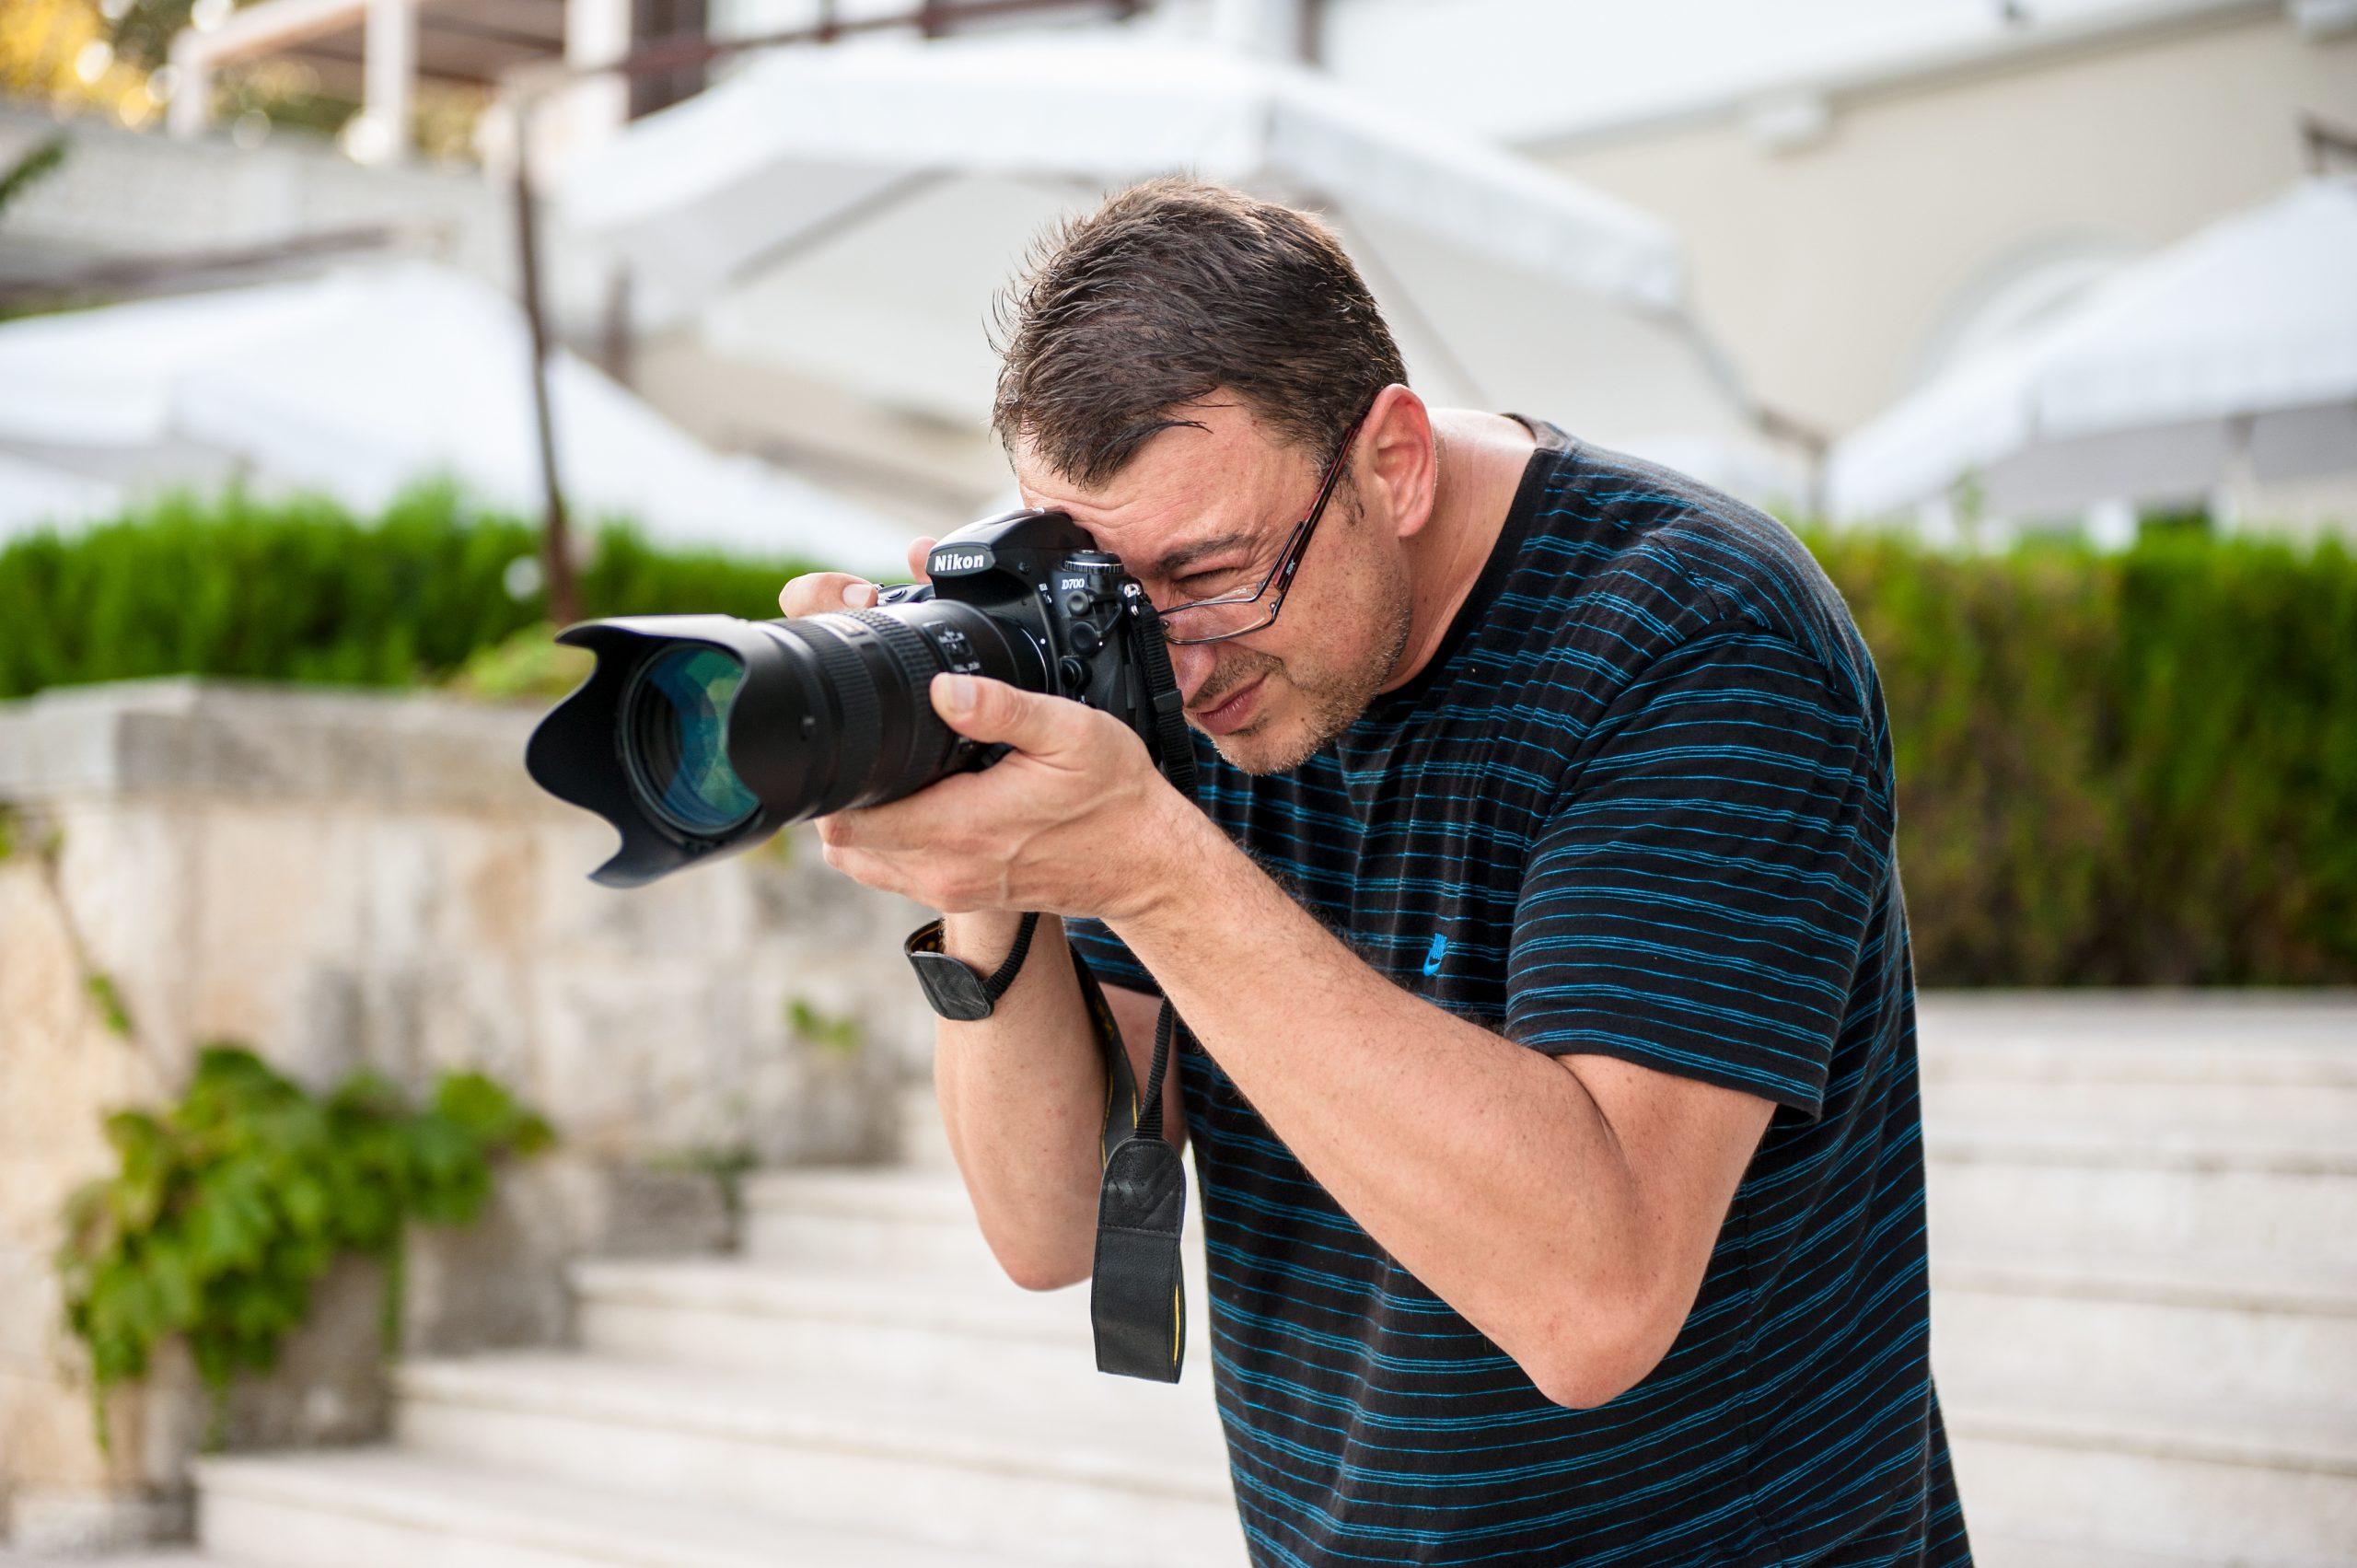 Професионален сватбен фотограф - Алекс Велчев